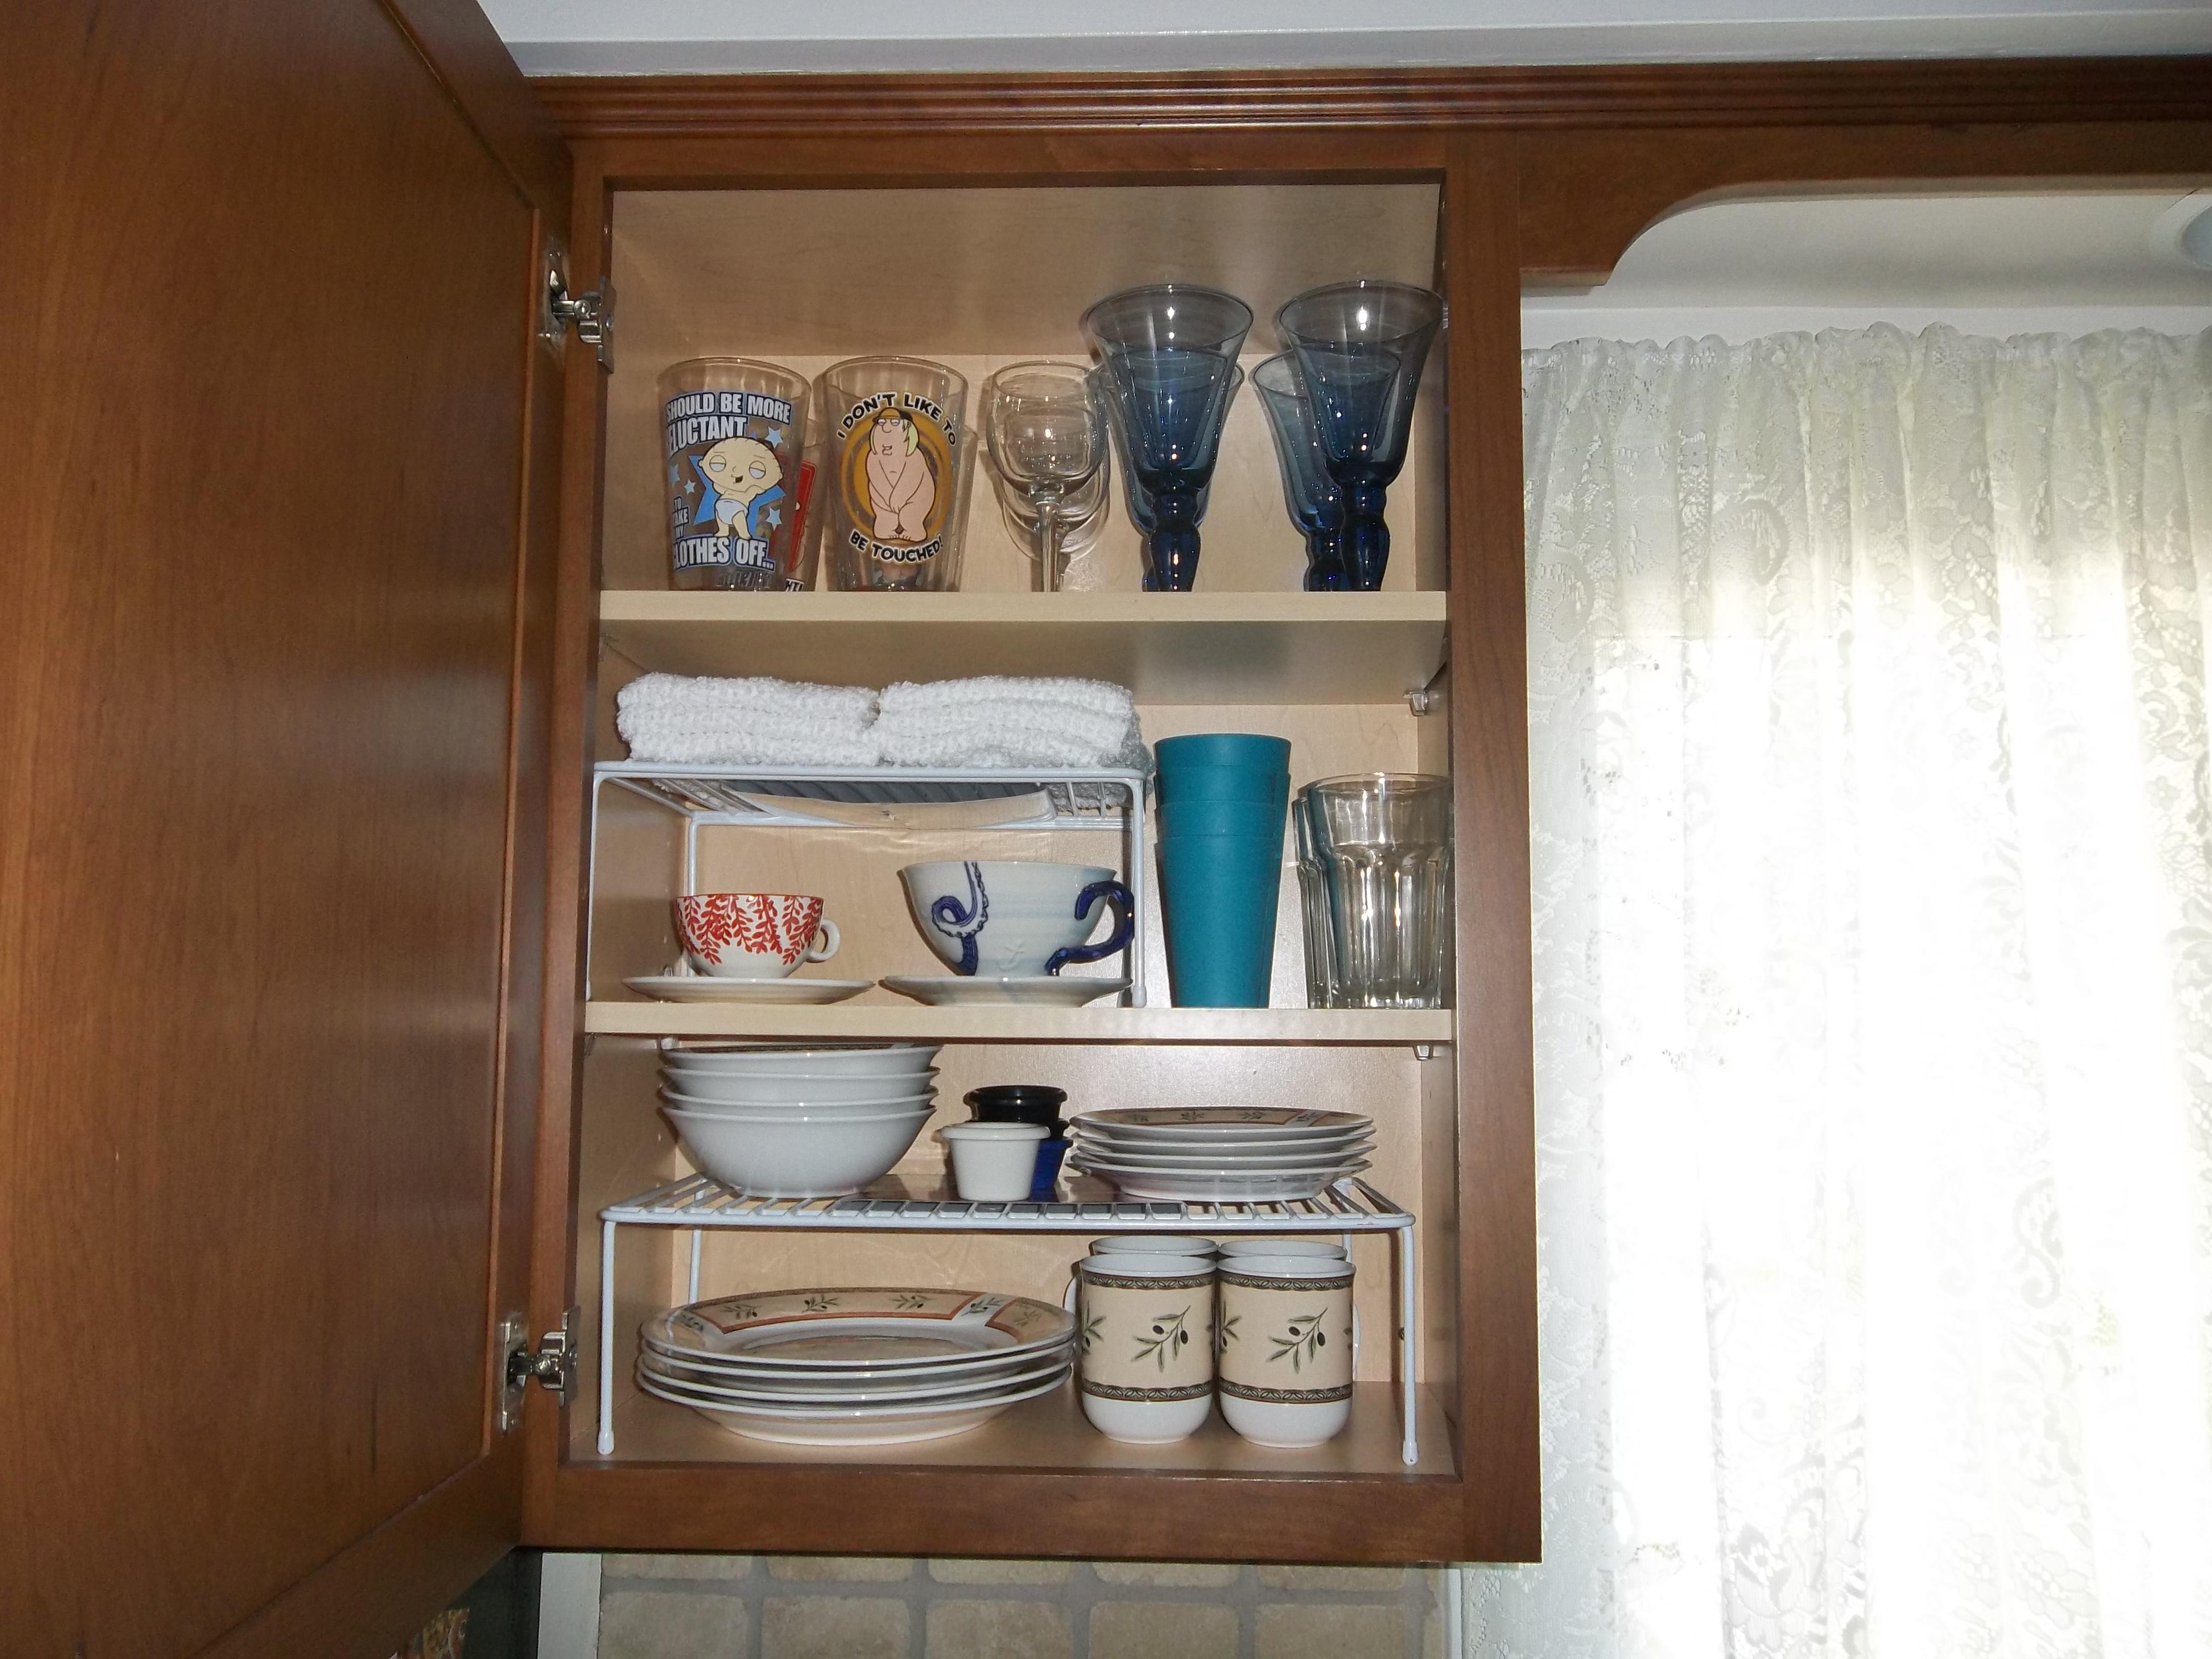 To Achieve Organized Kitchen Cabinets